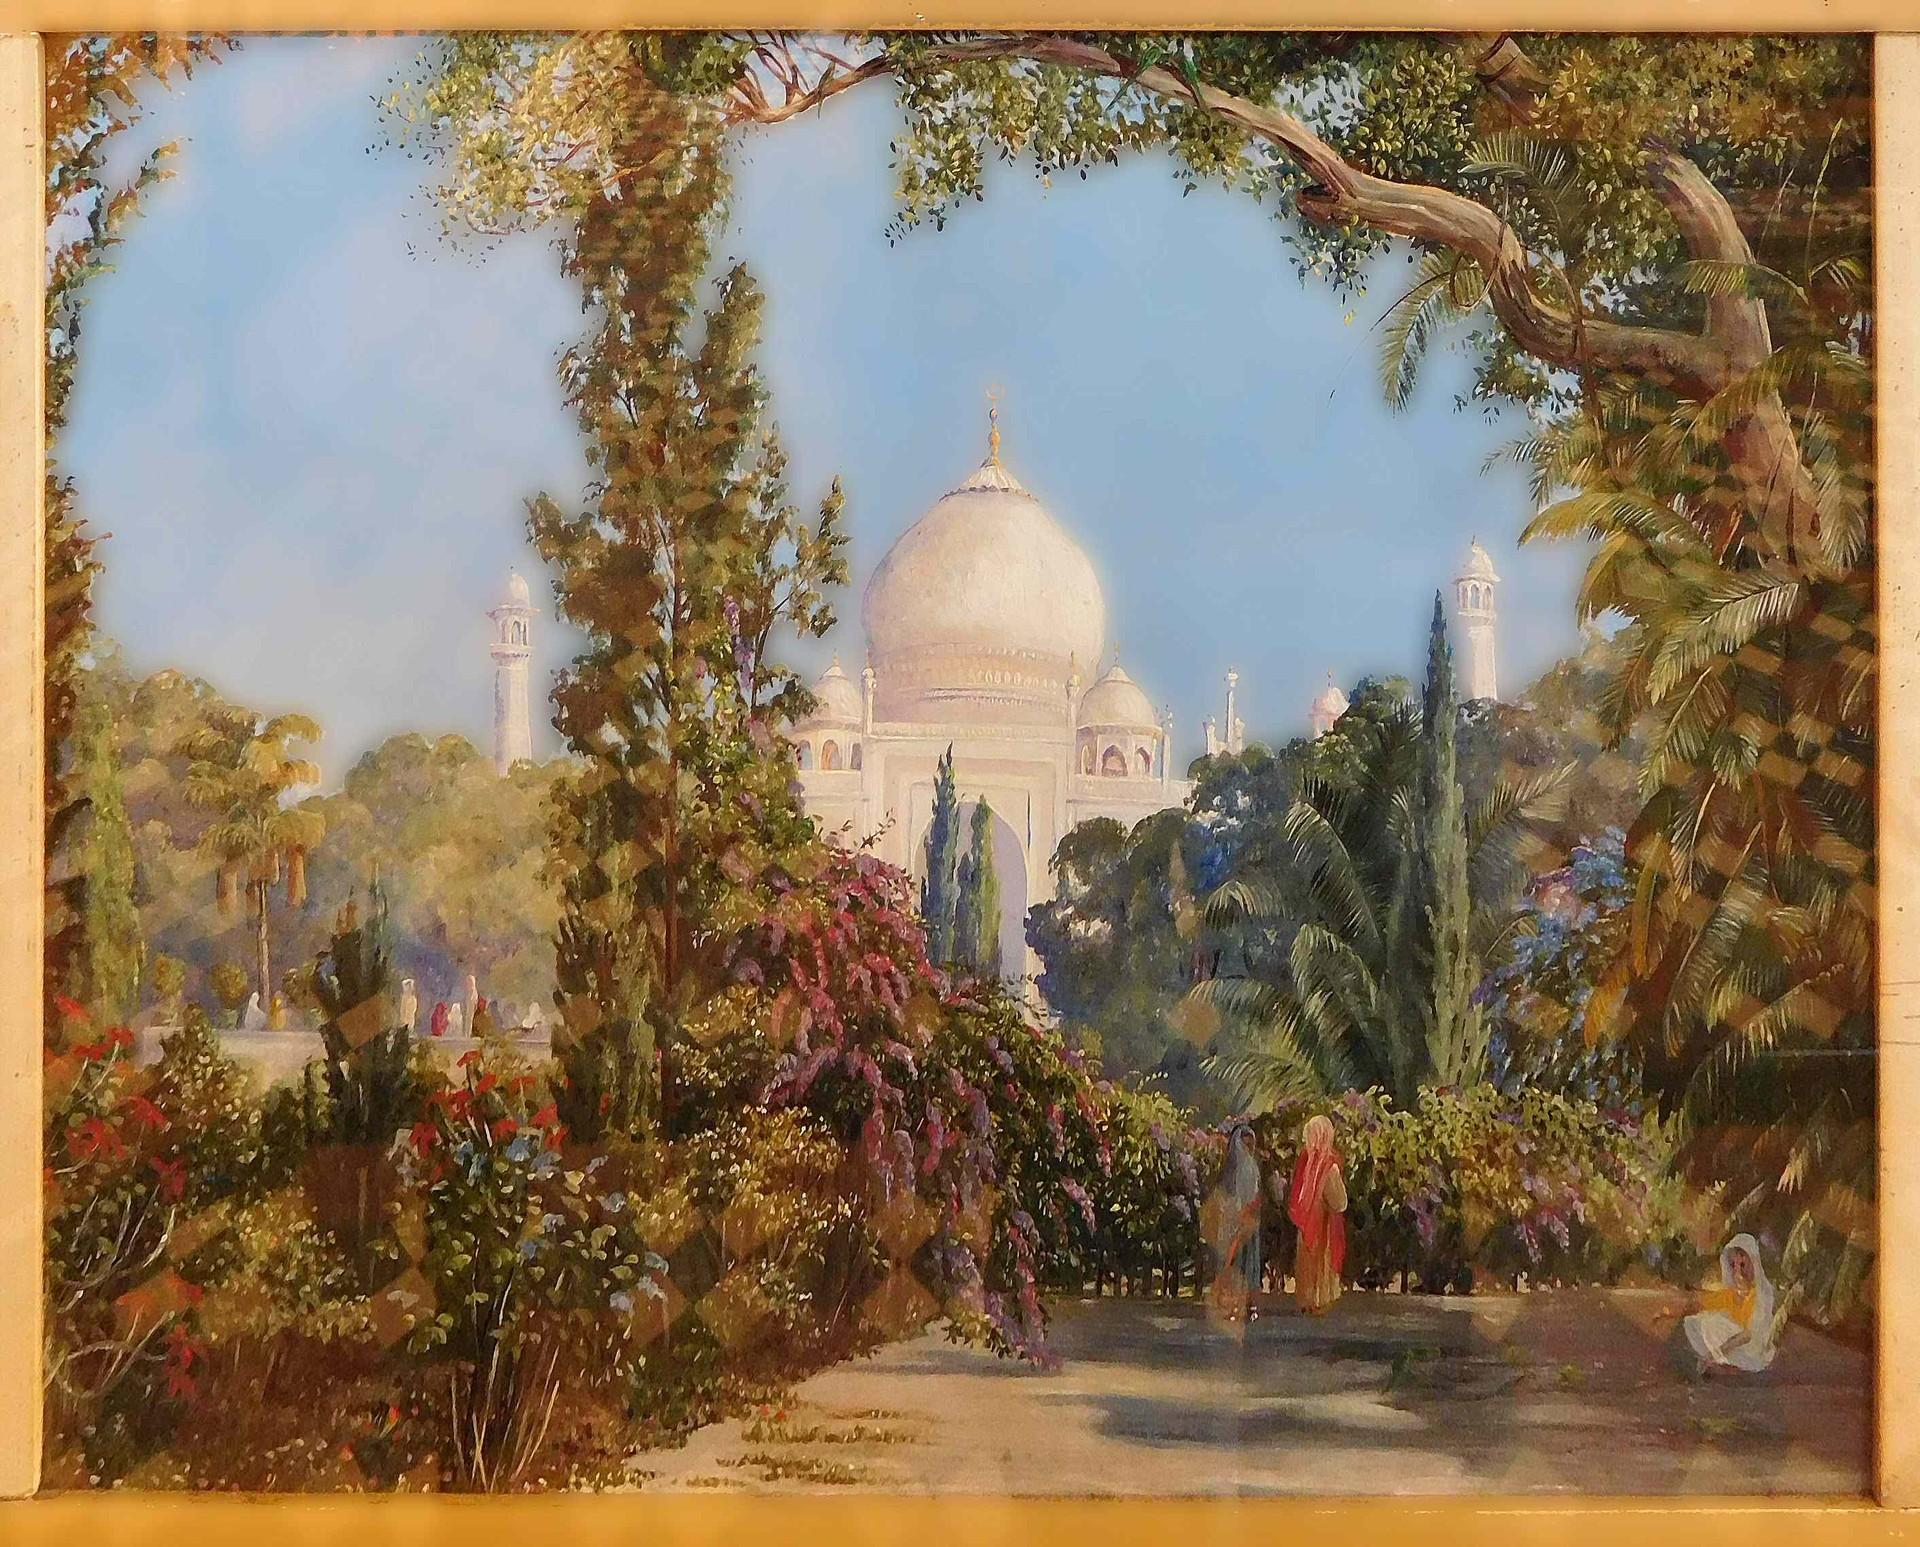 Taj Mahal in India, by Marianne North